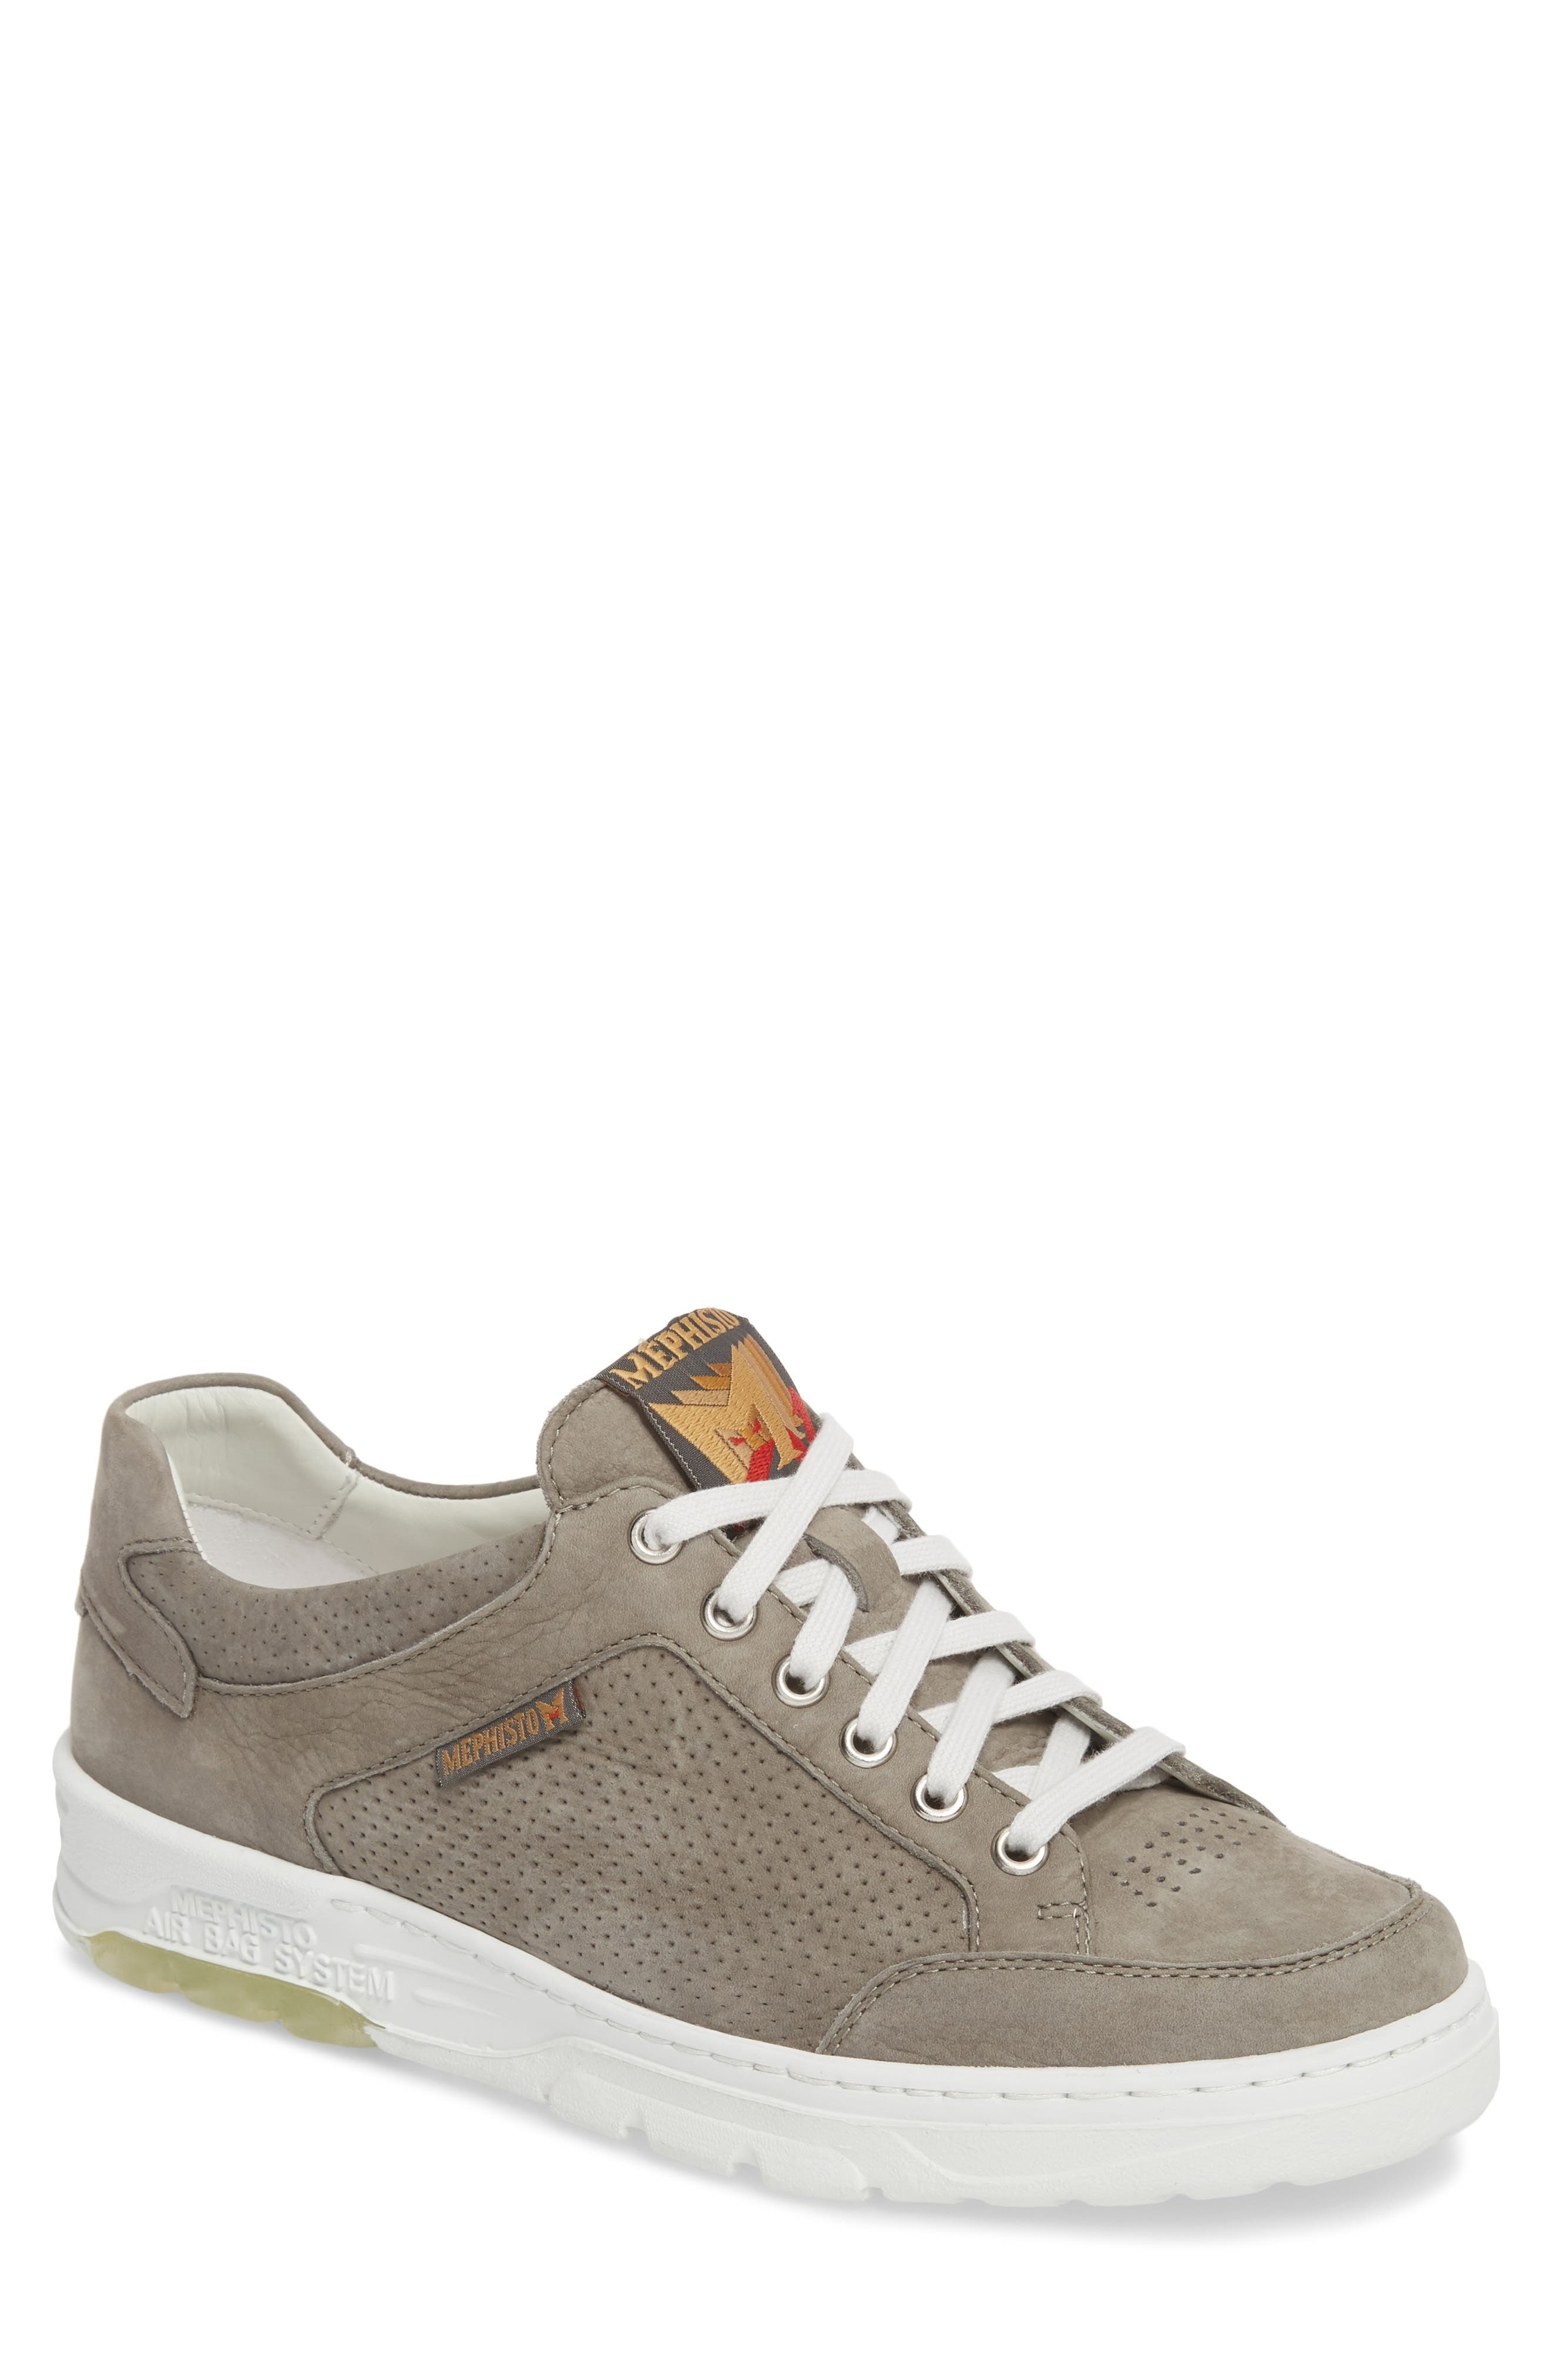 Mathias Perforated Sneaker,                             Main thumbnail 1, color,                             Light Grey